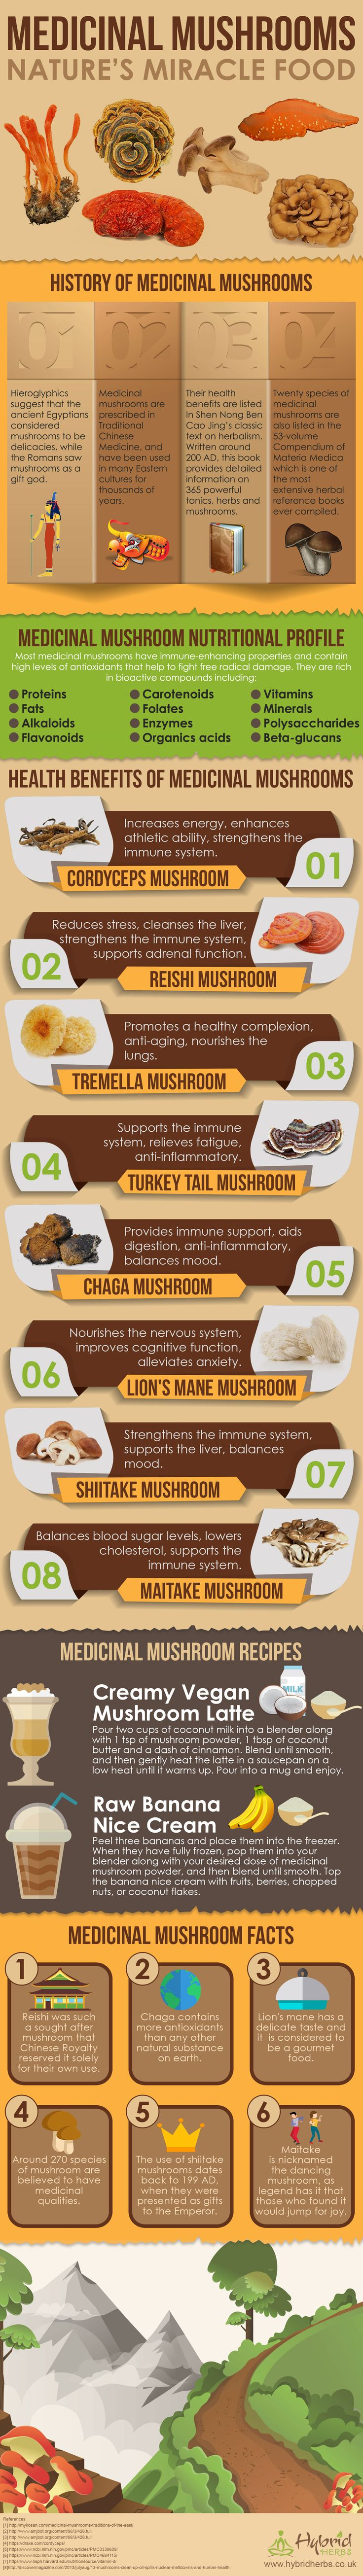 Life inspirations: Medicinal Mushroom Health Benefits